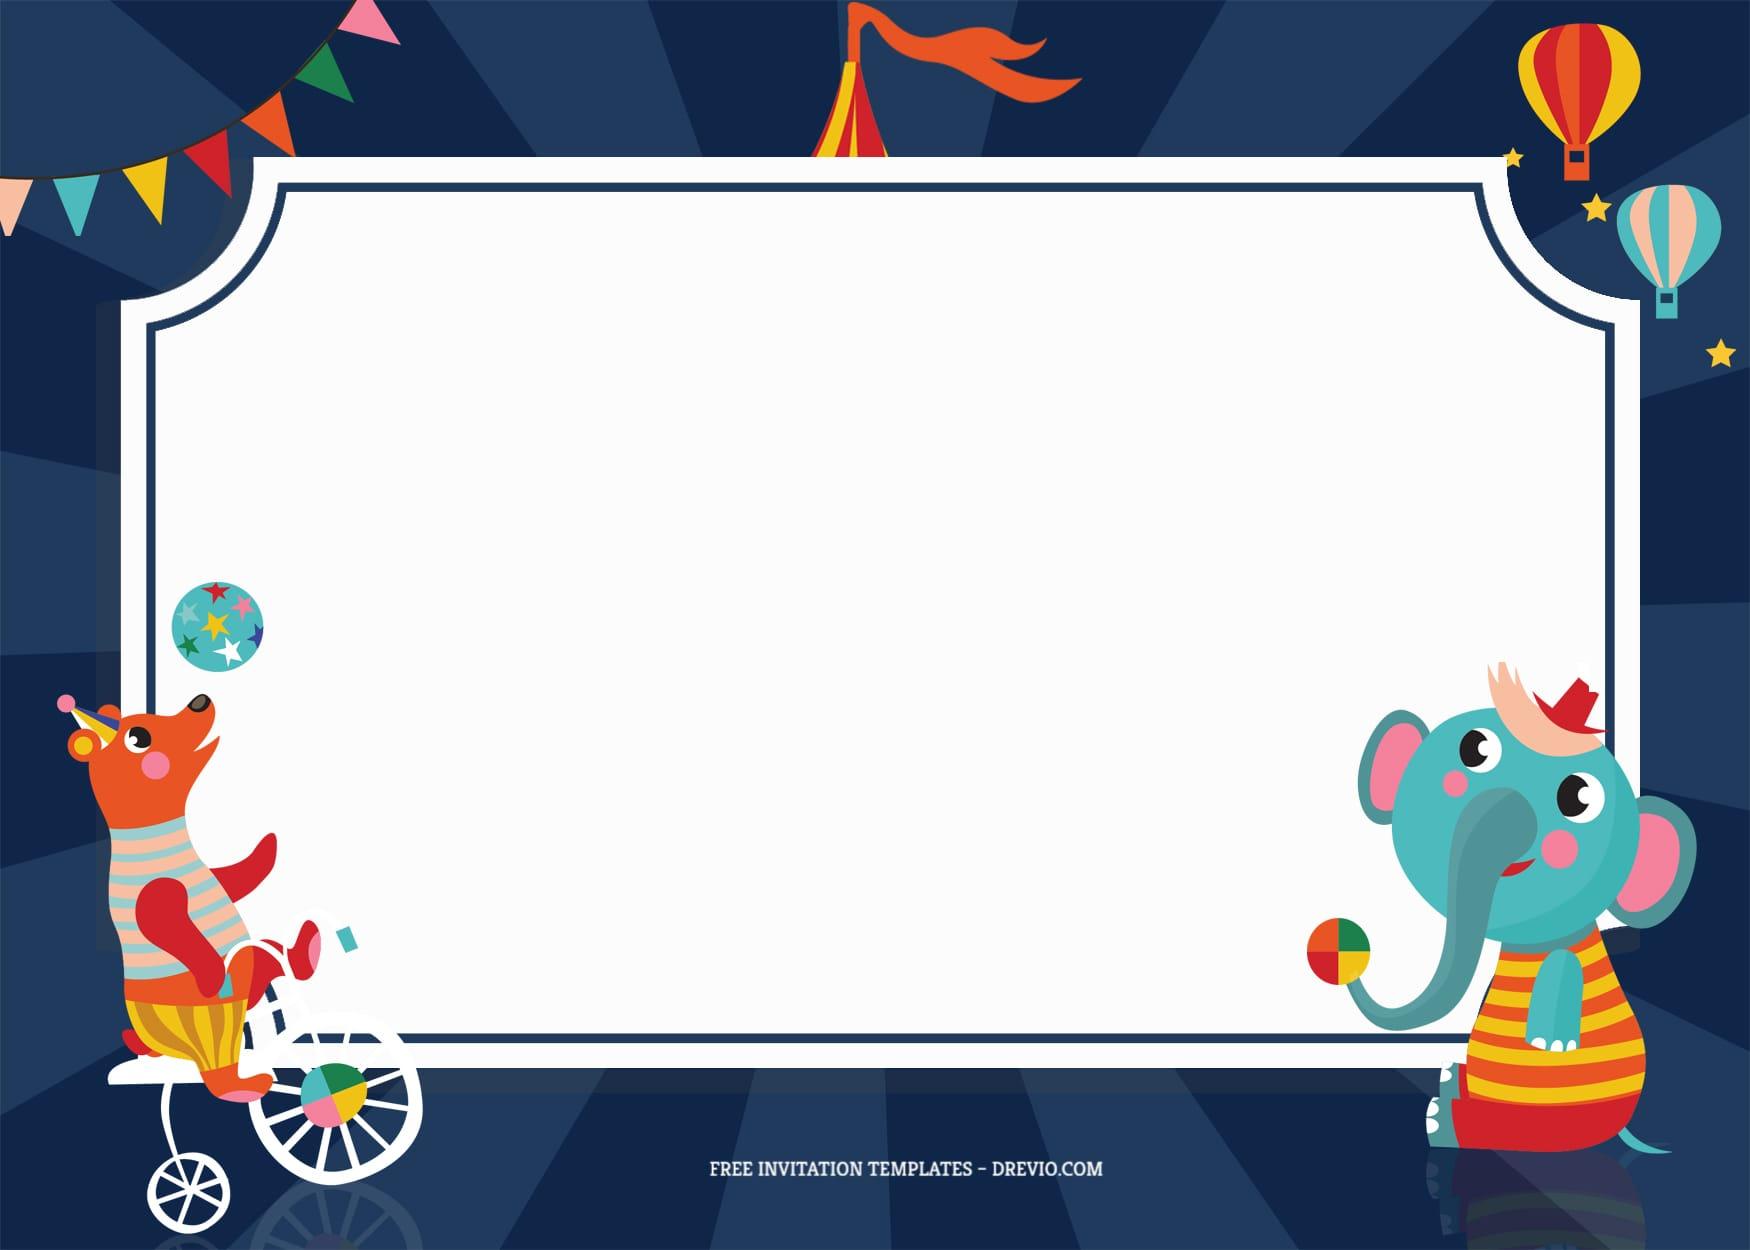 7+ Festive Carnival Party Birthday Invitation Templates With Bear And Elephant